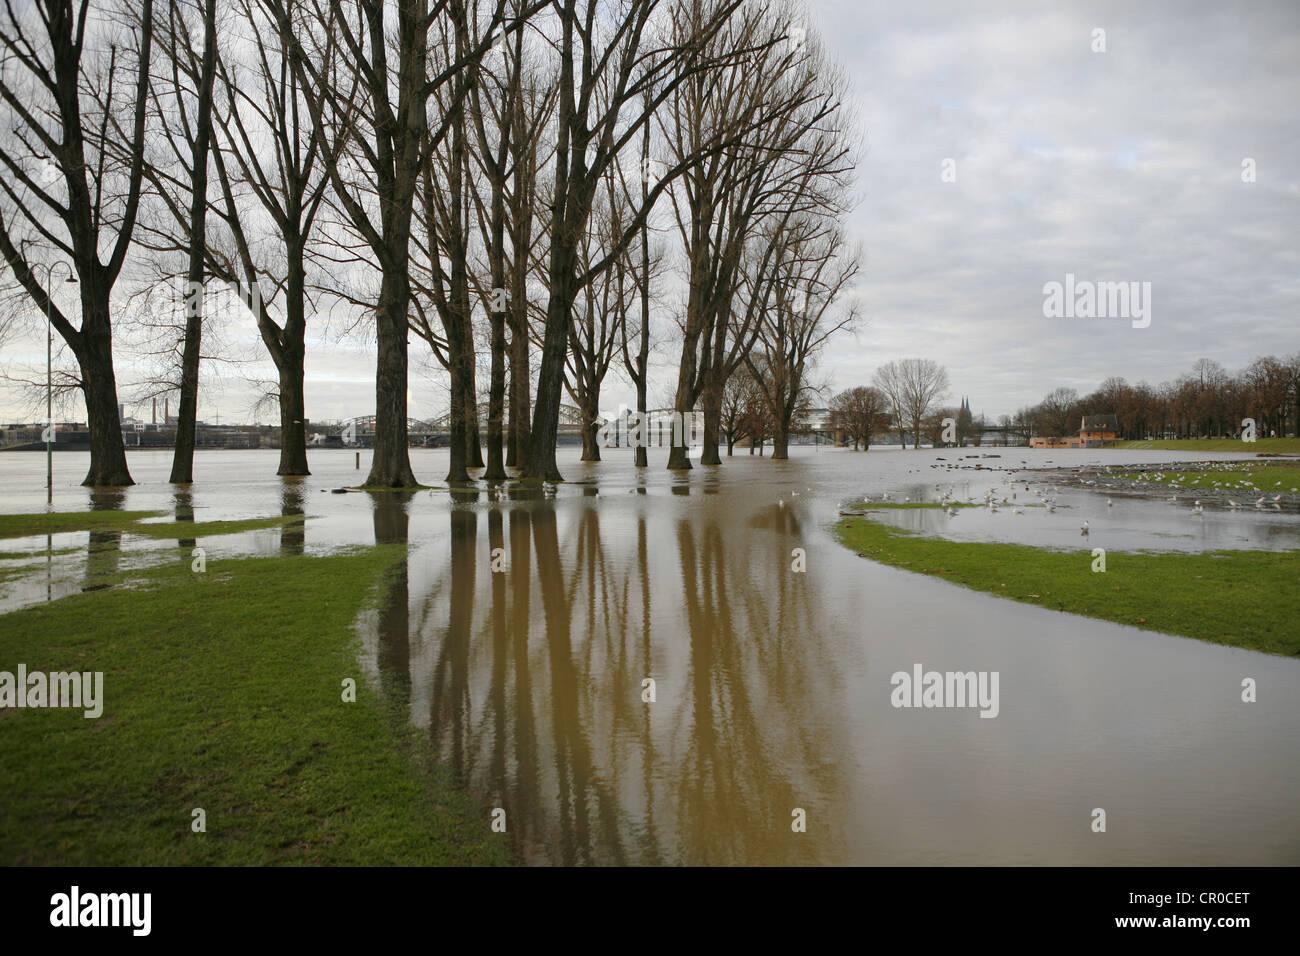 Flood, January 2011, Poller meadows, Koeln-Poll, Cologne, North Rhine-Westphalia, Germany, Europe - Stock Image